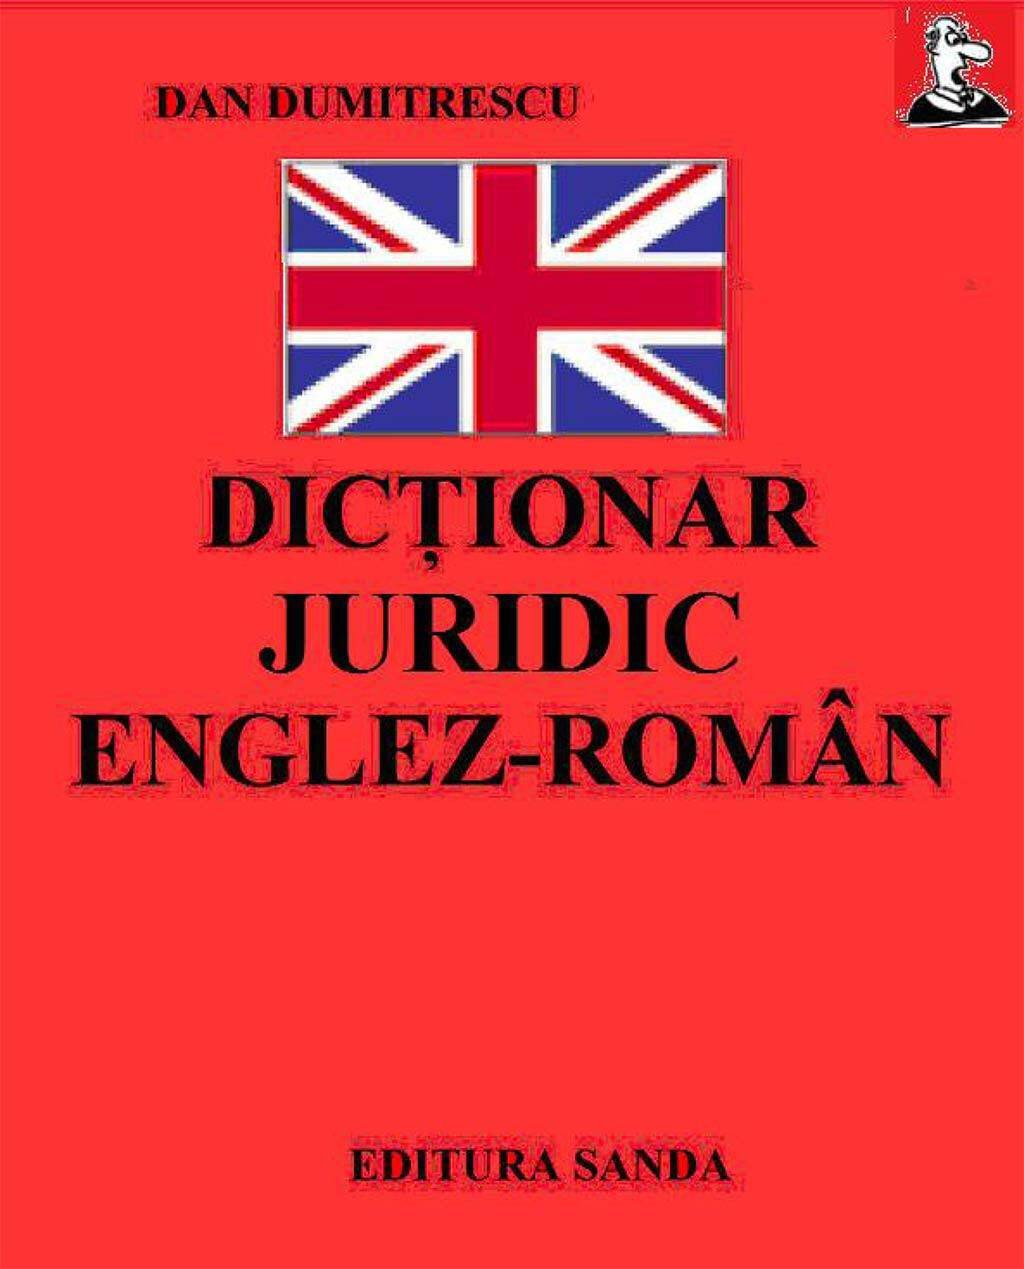 Dictionar juridic Englez-Roman (eBook)